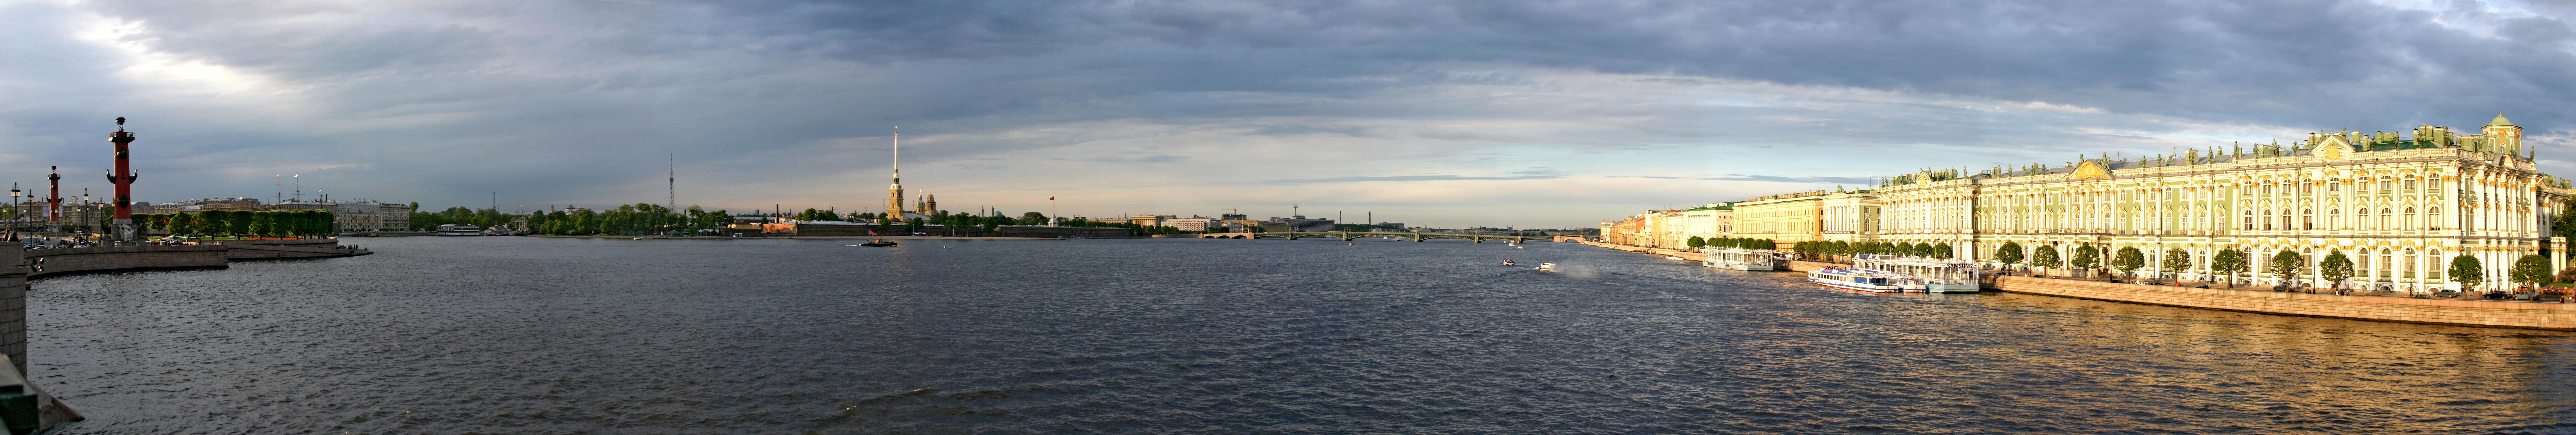 Панорама Санкт-Петеребурга с Дворцового моста